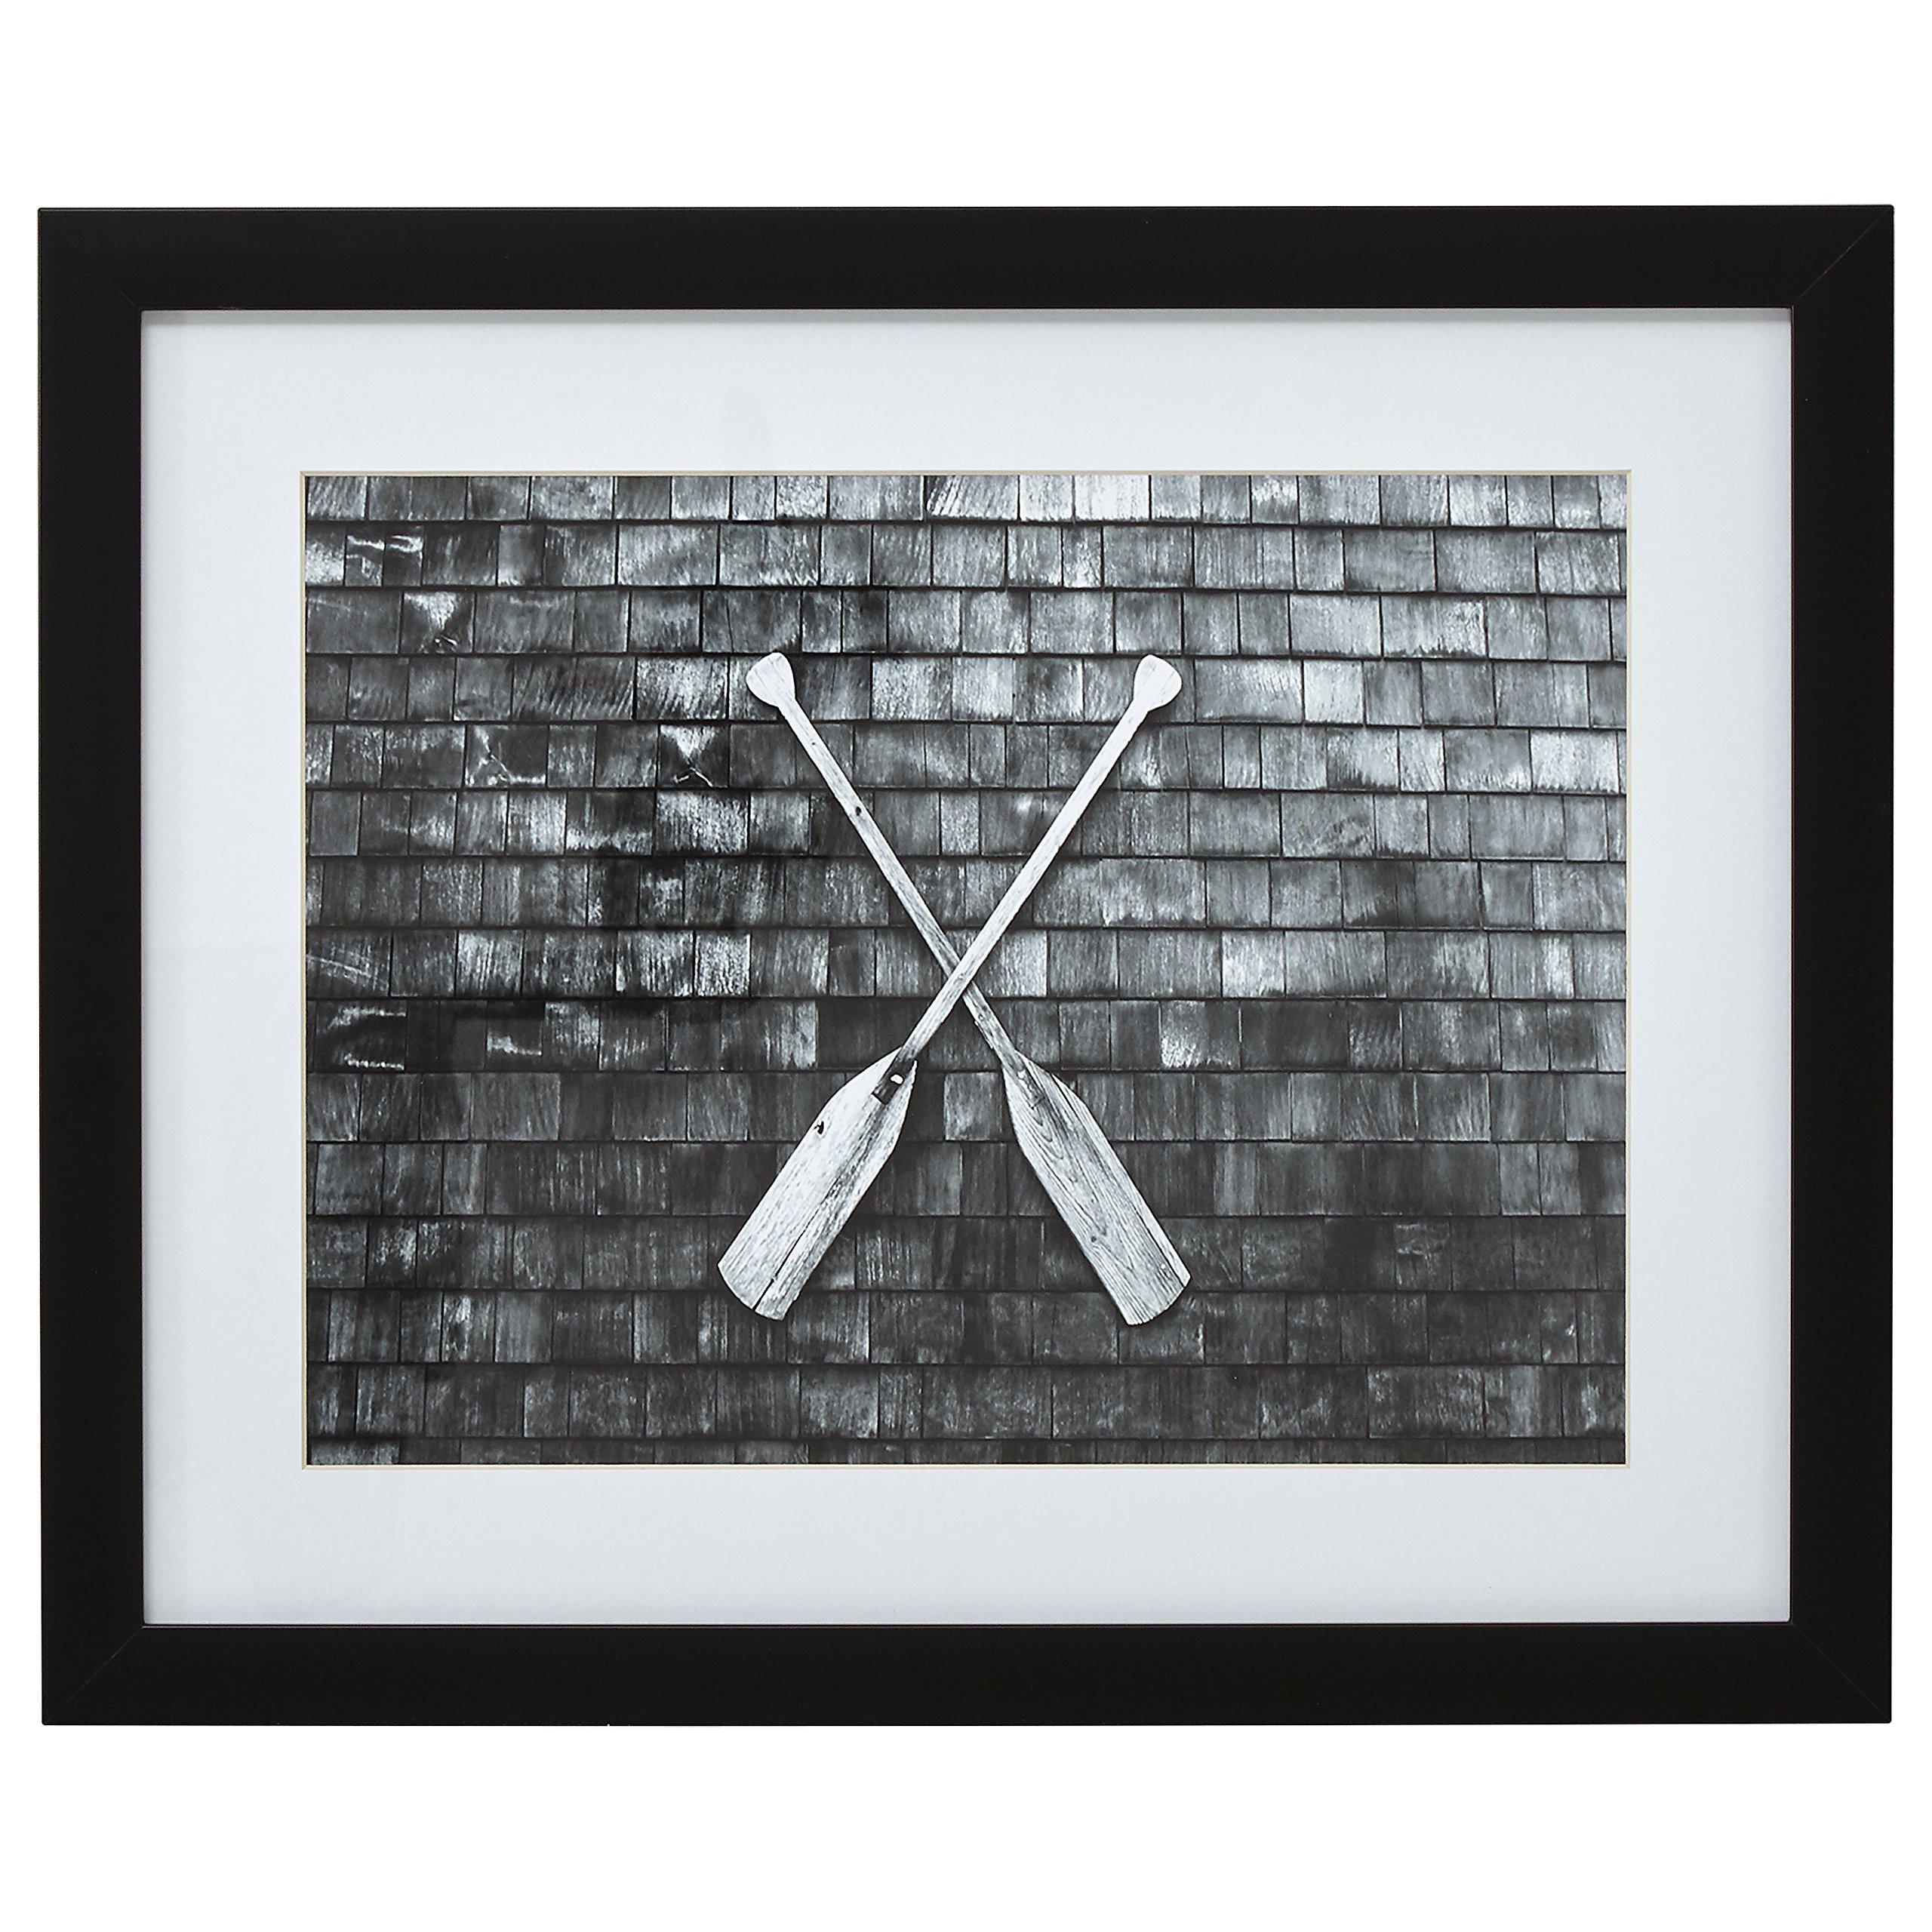 Stone & Beam Black and White Crossed Oars Photo, Black Frame, 13'' x 15'' by Stone & Beam